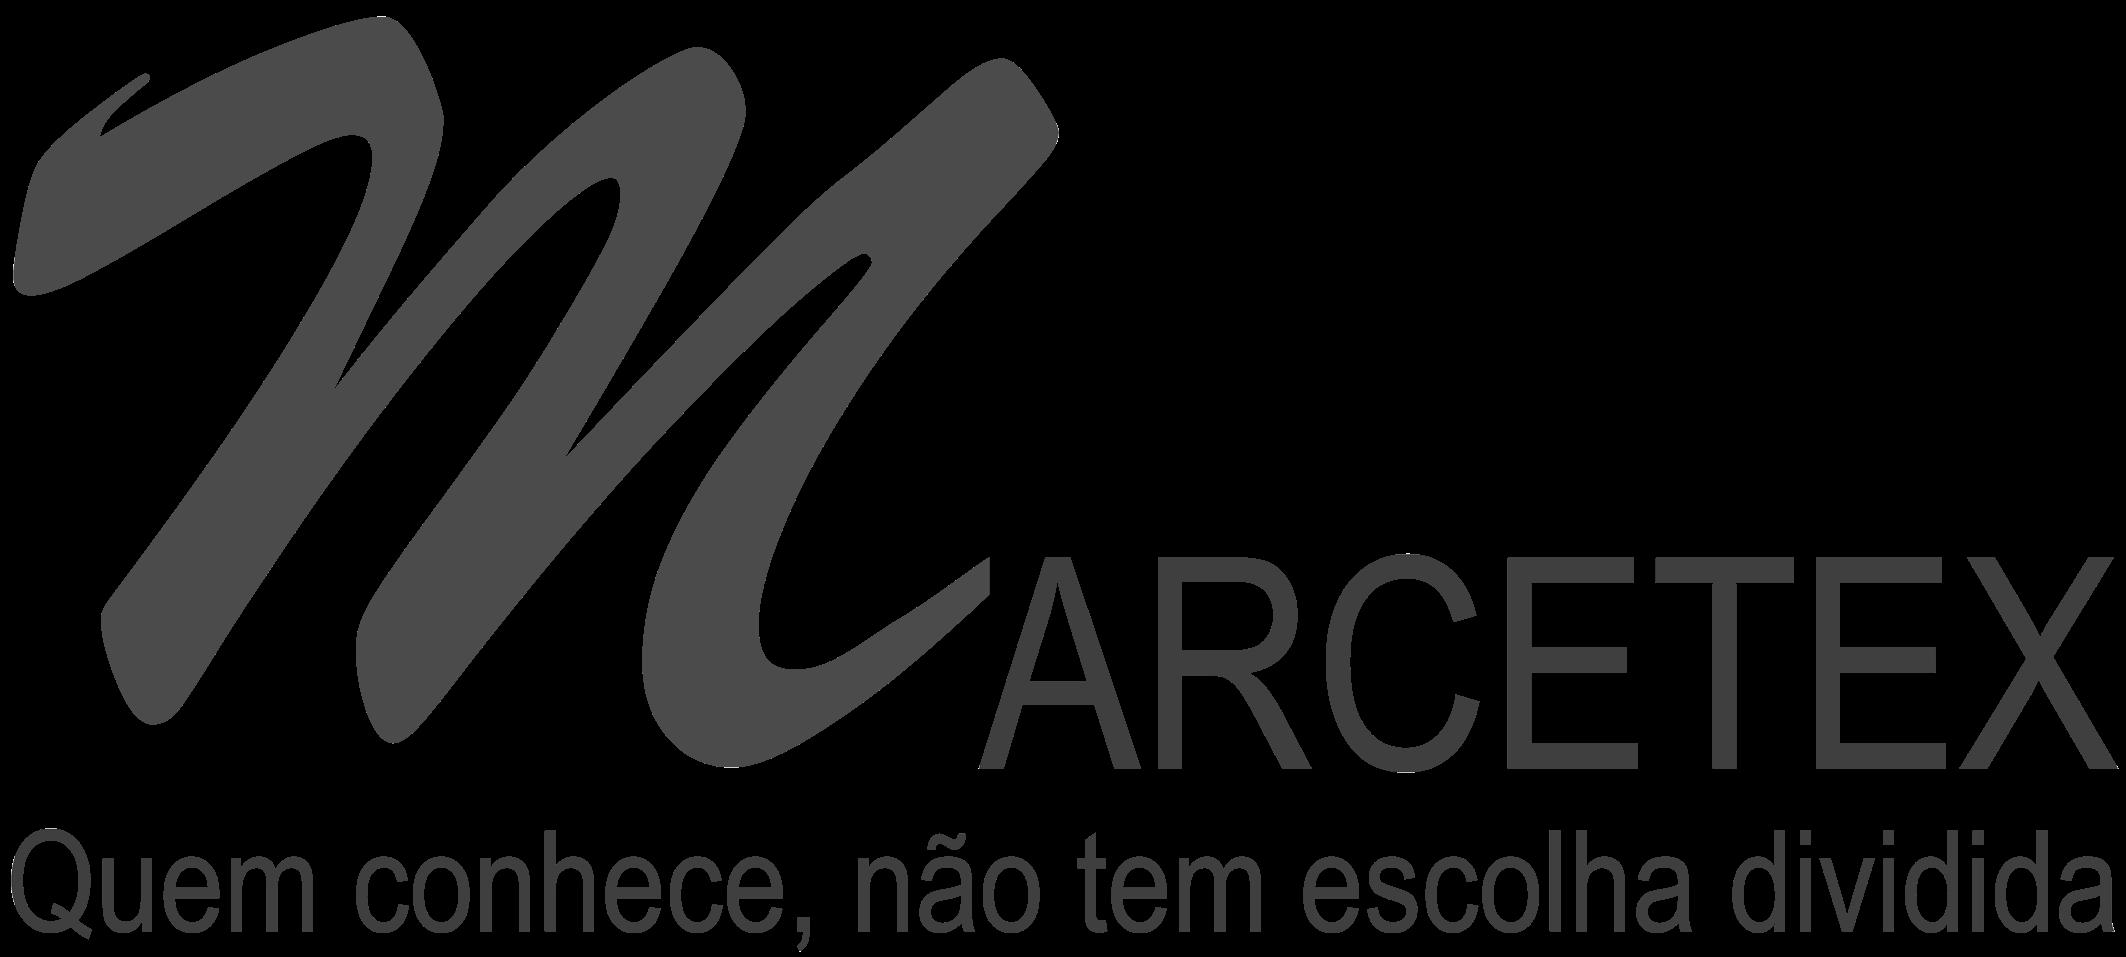 Marcetex